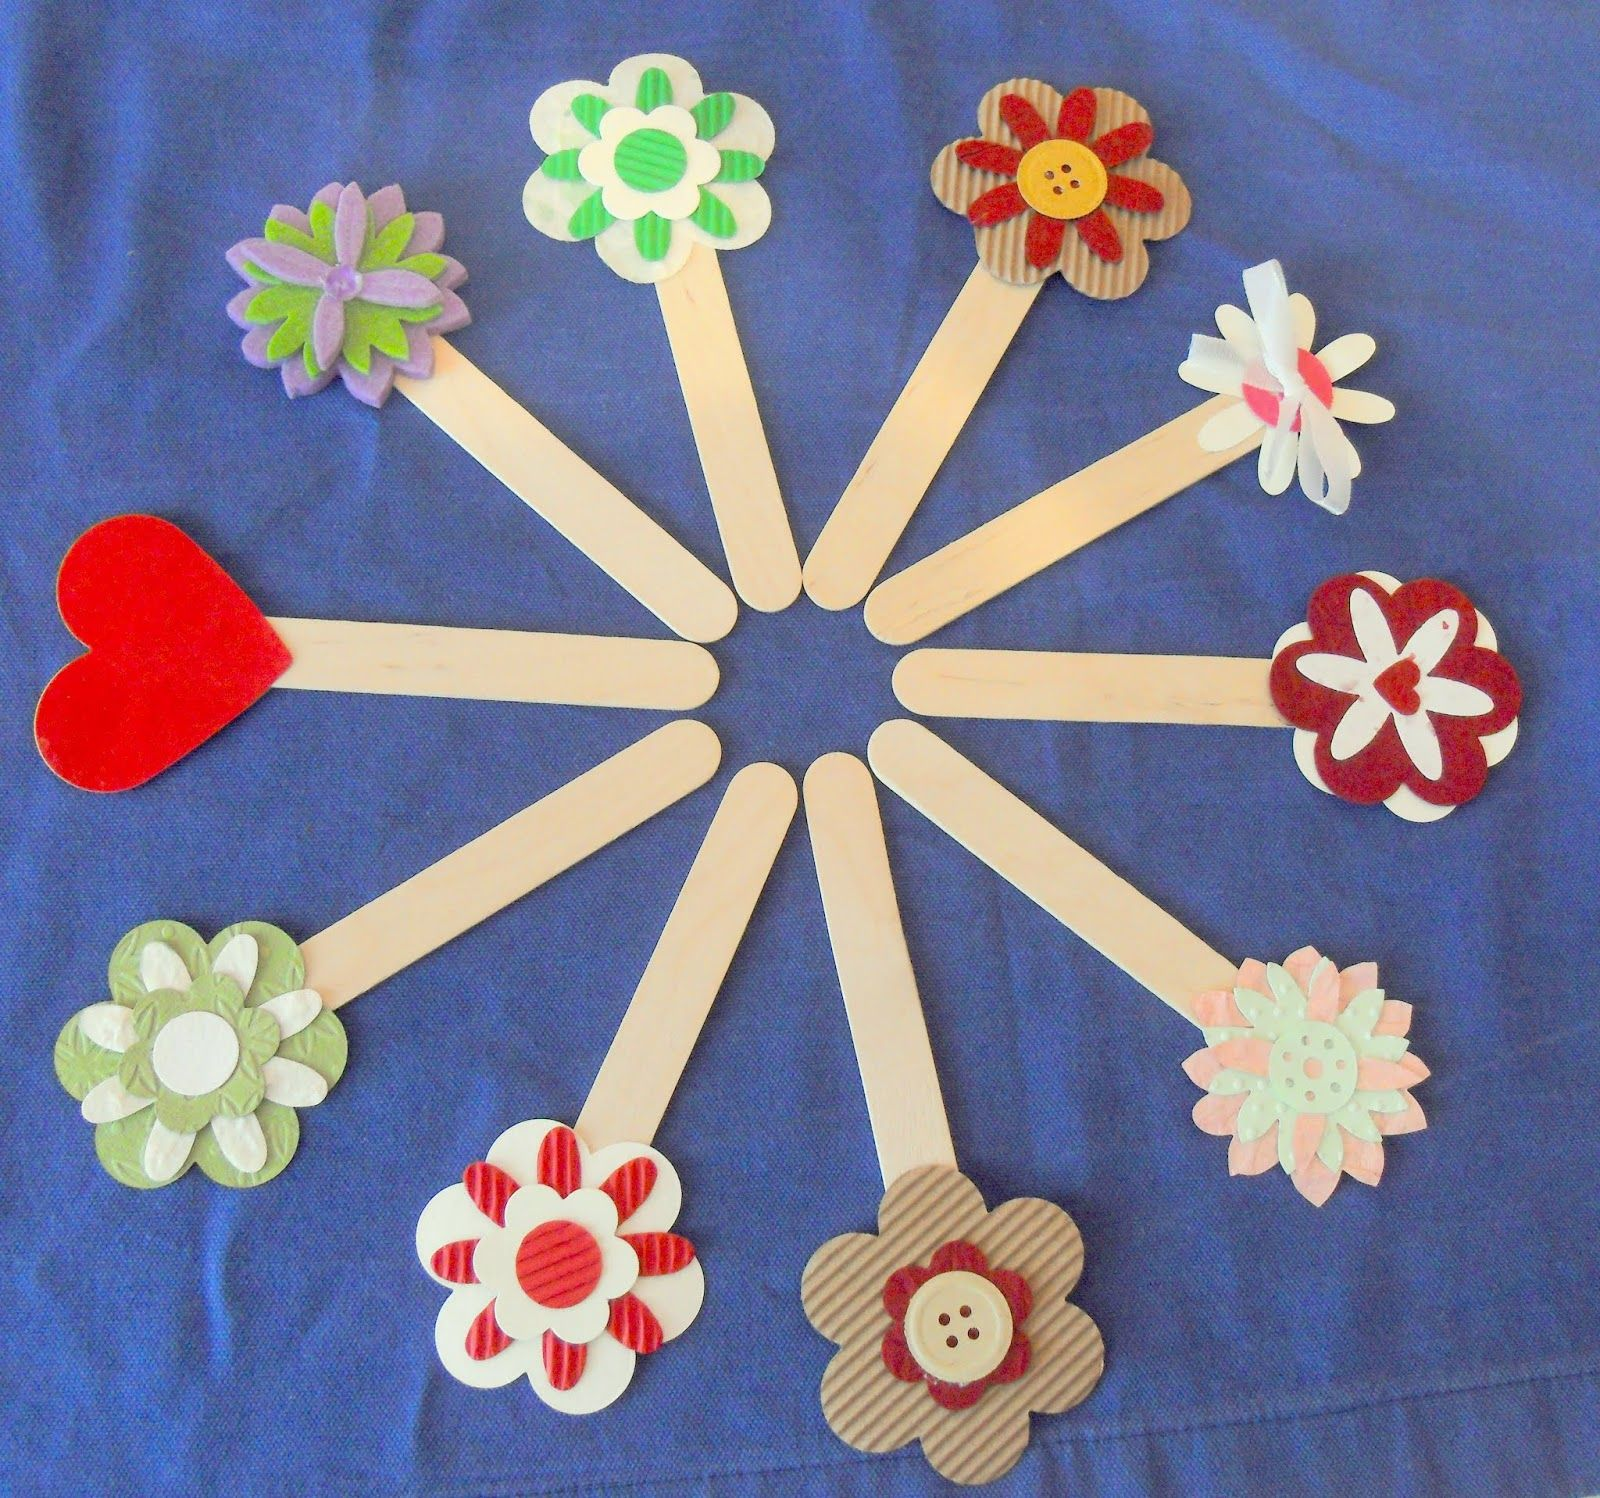 Segnalibri Stecco Abbassalingua O Paletta Carta Craft Stick